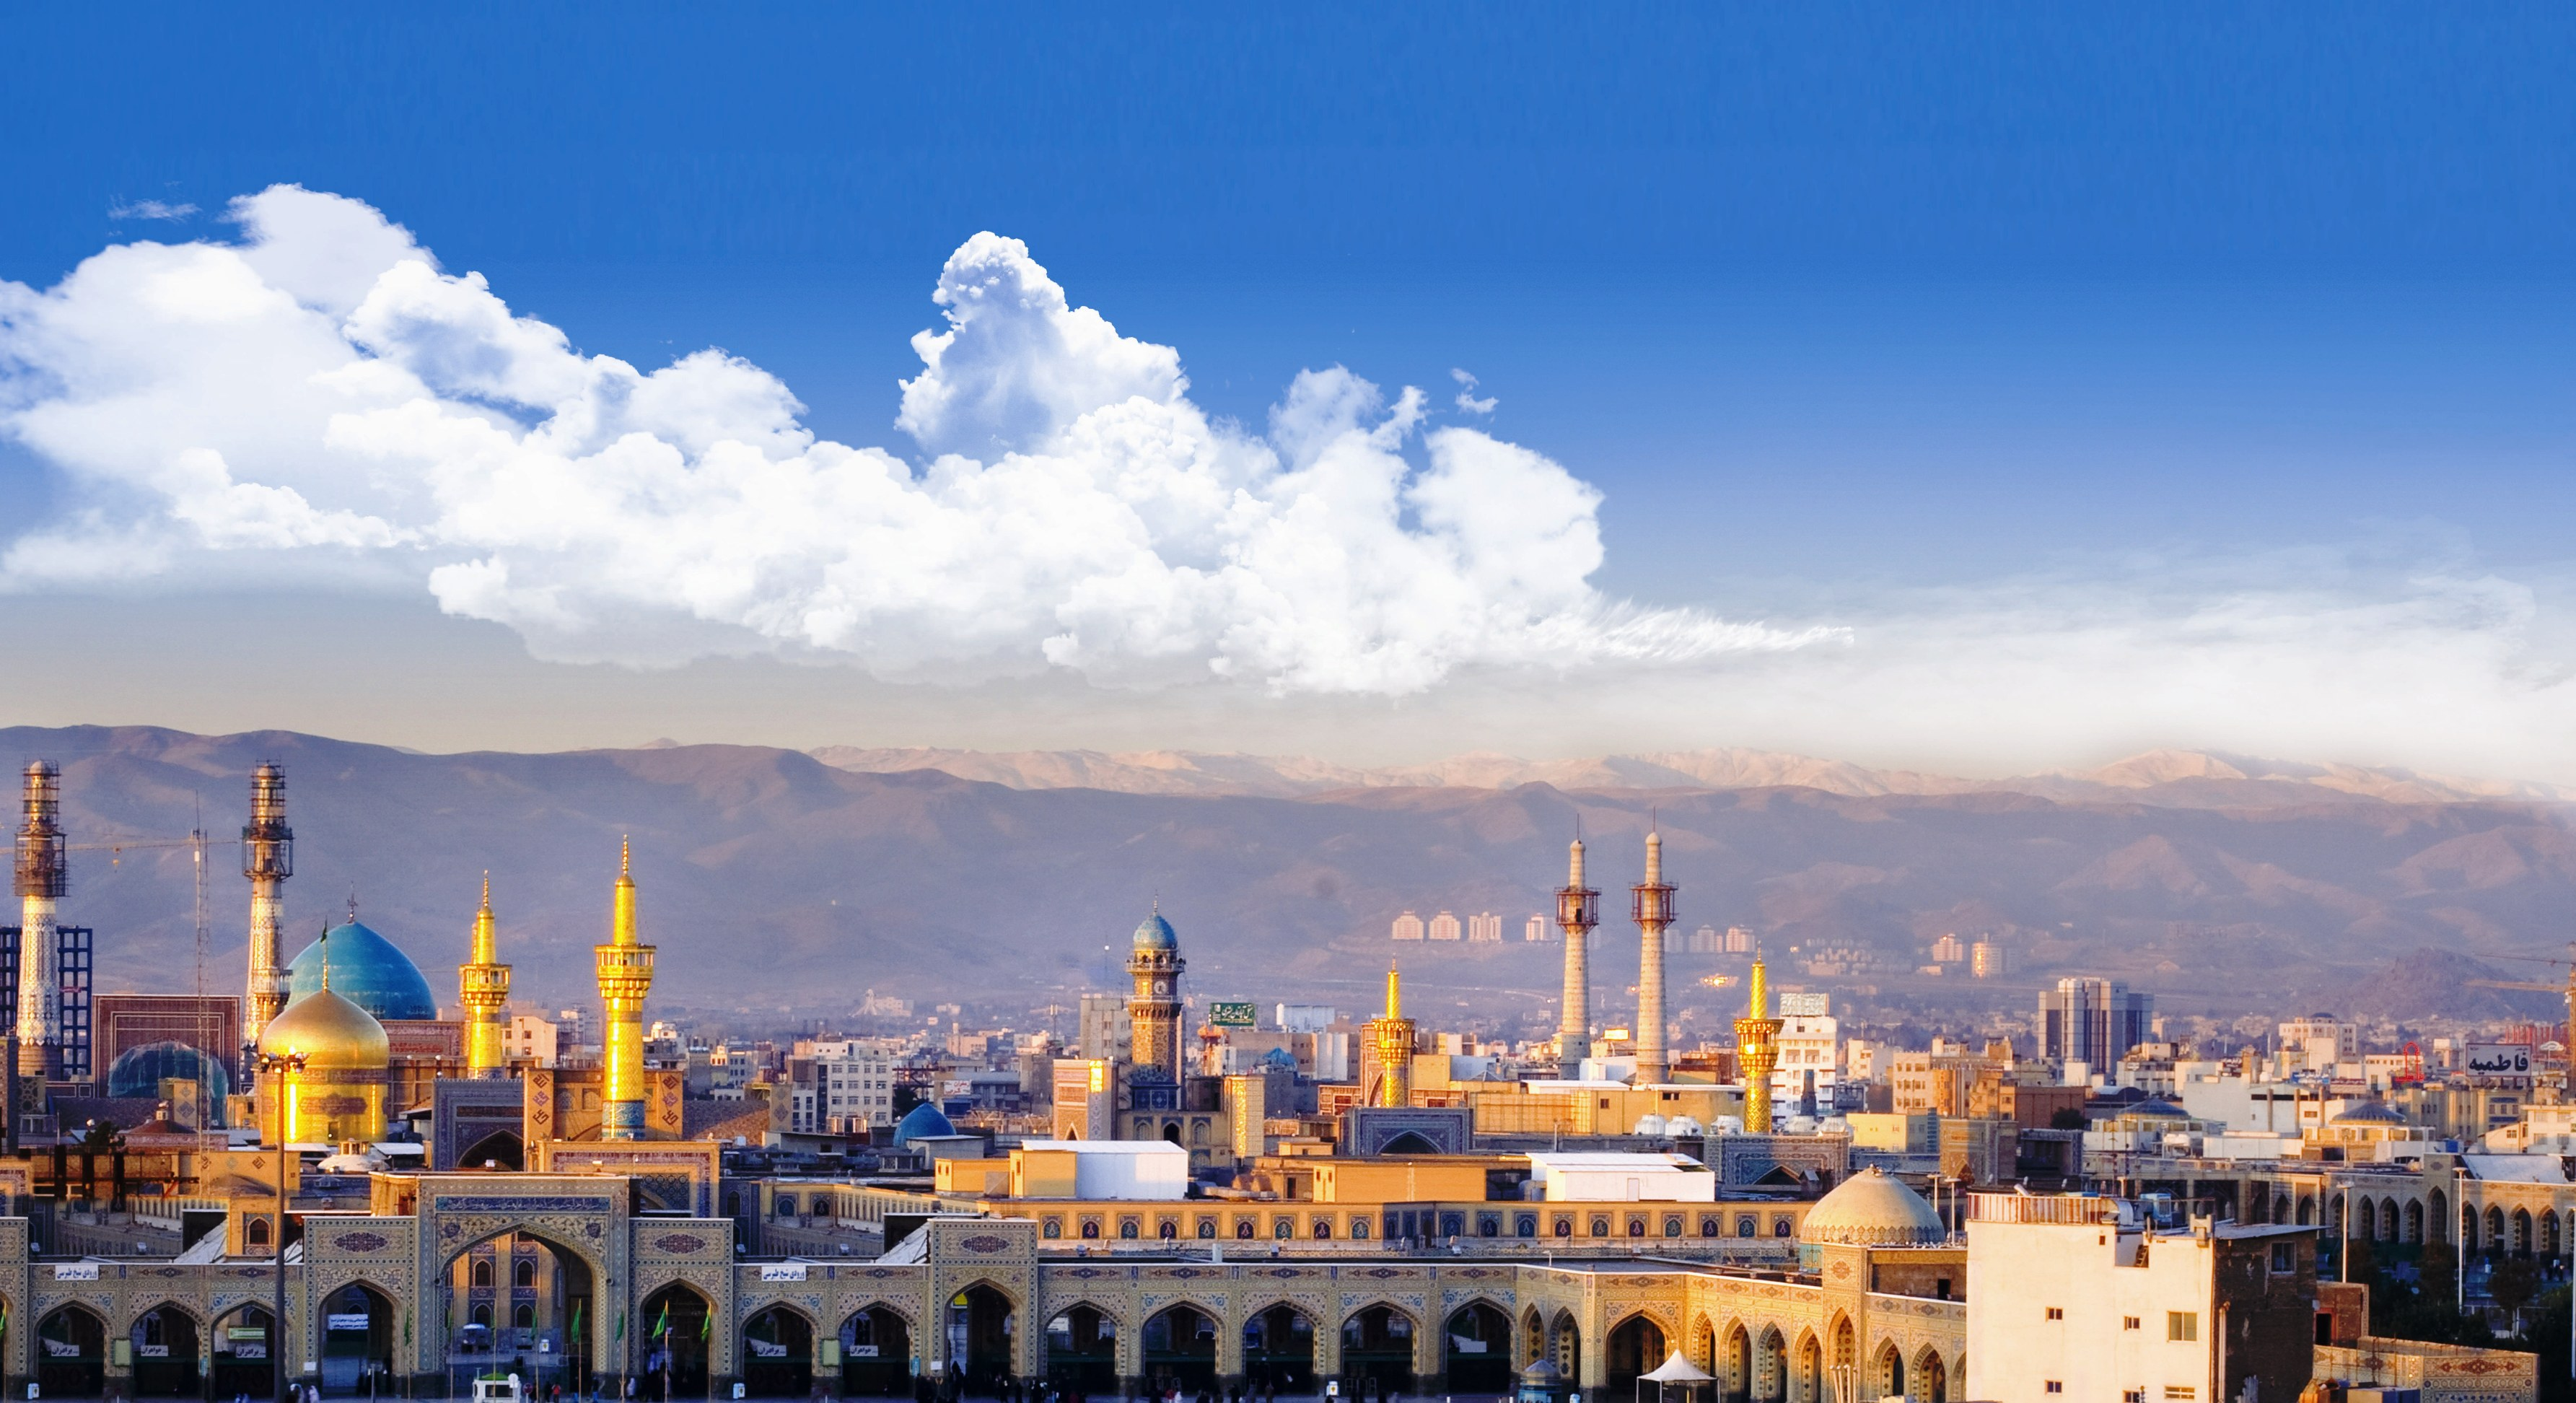 Day 2: Tehran – Mashhad